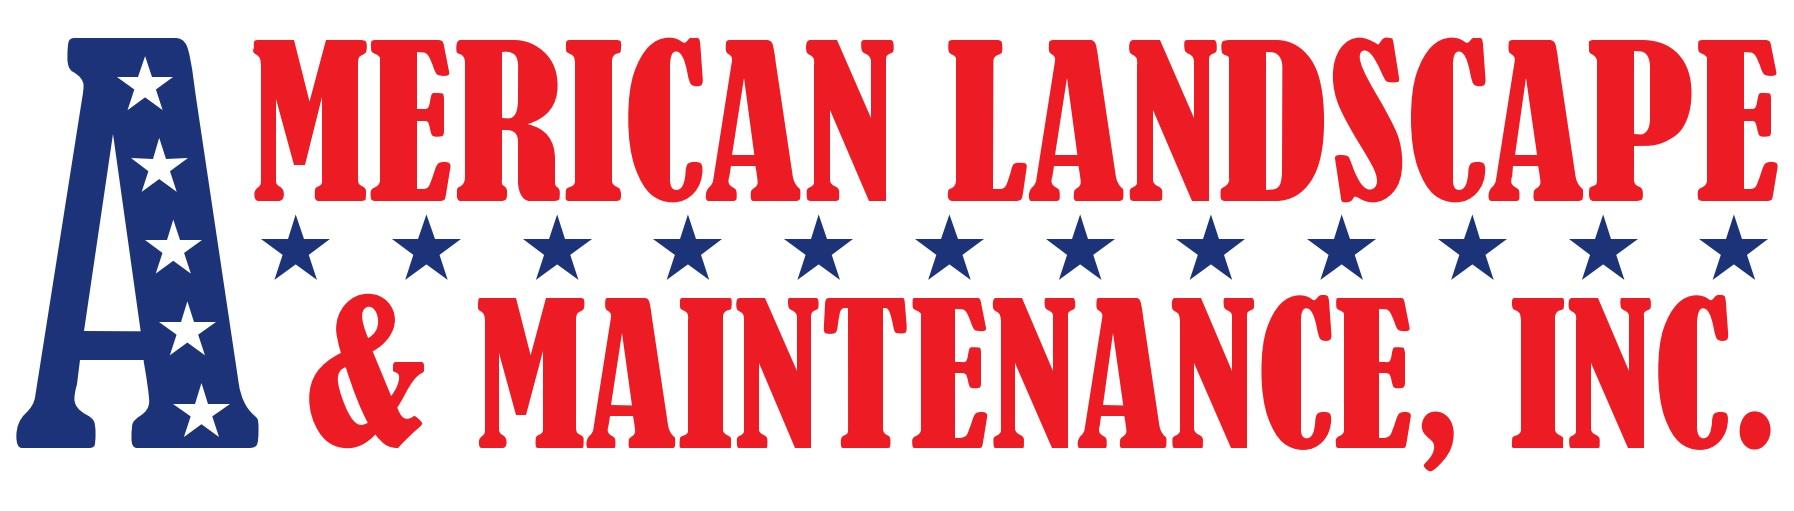 18_AmericanLandscape_Logo.jpg